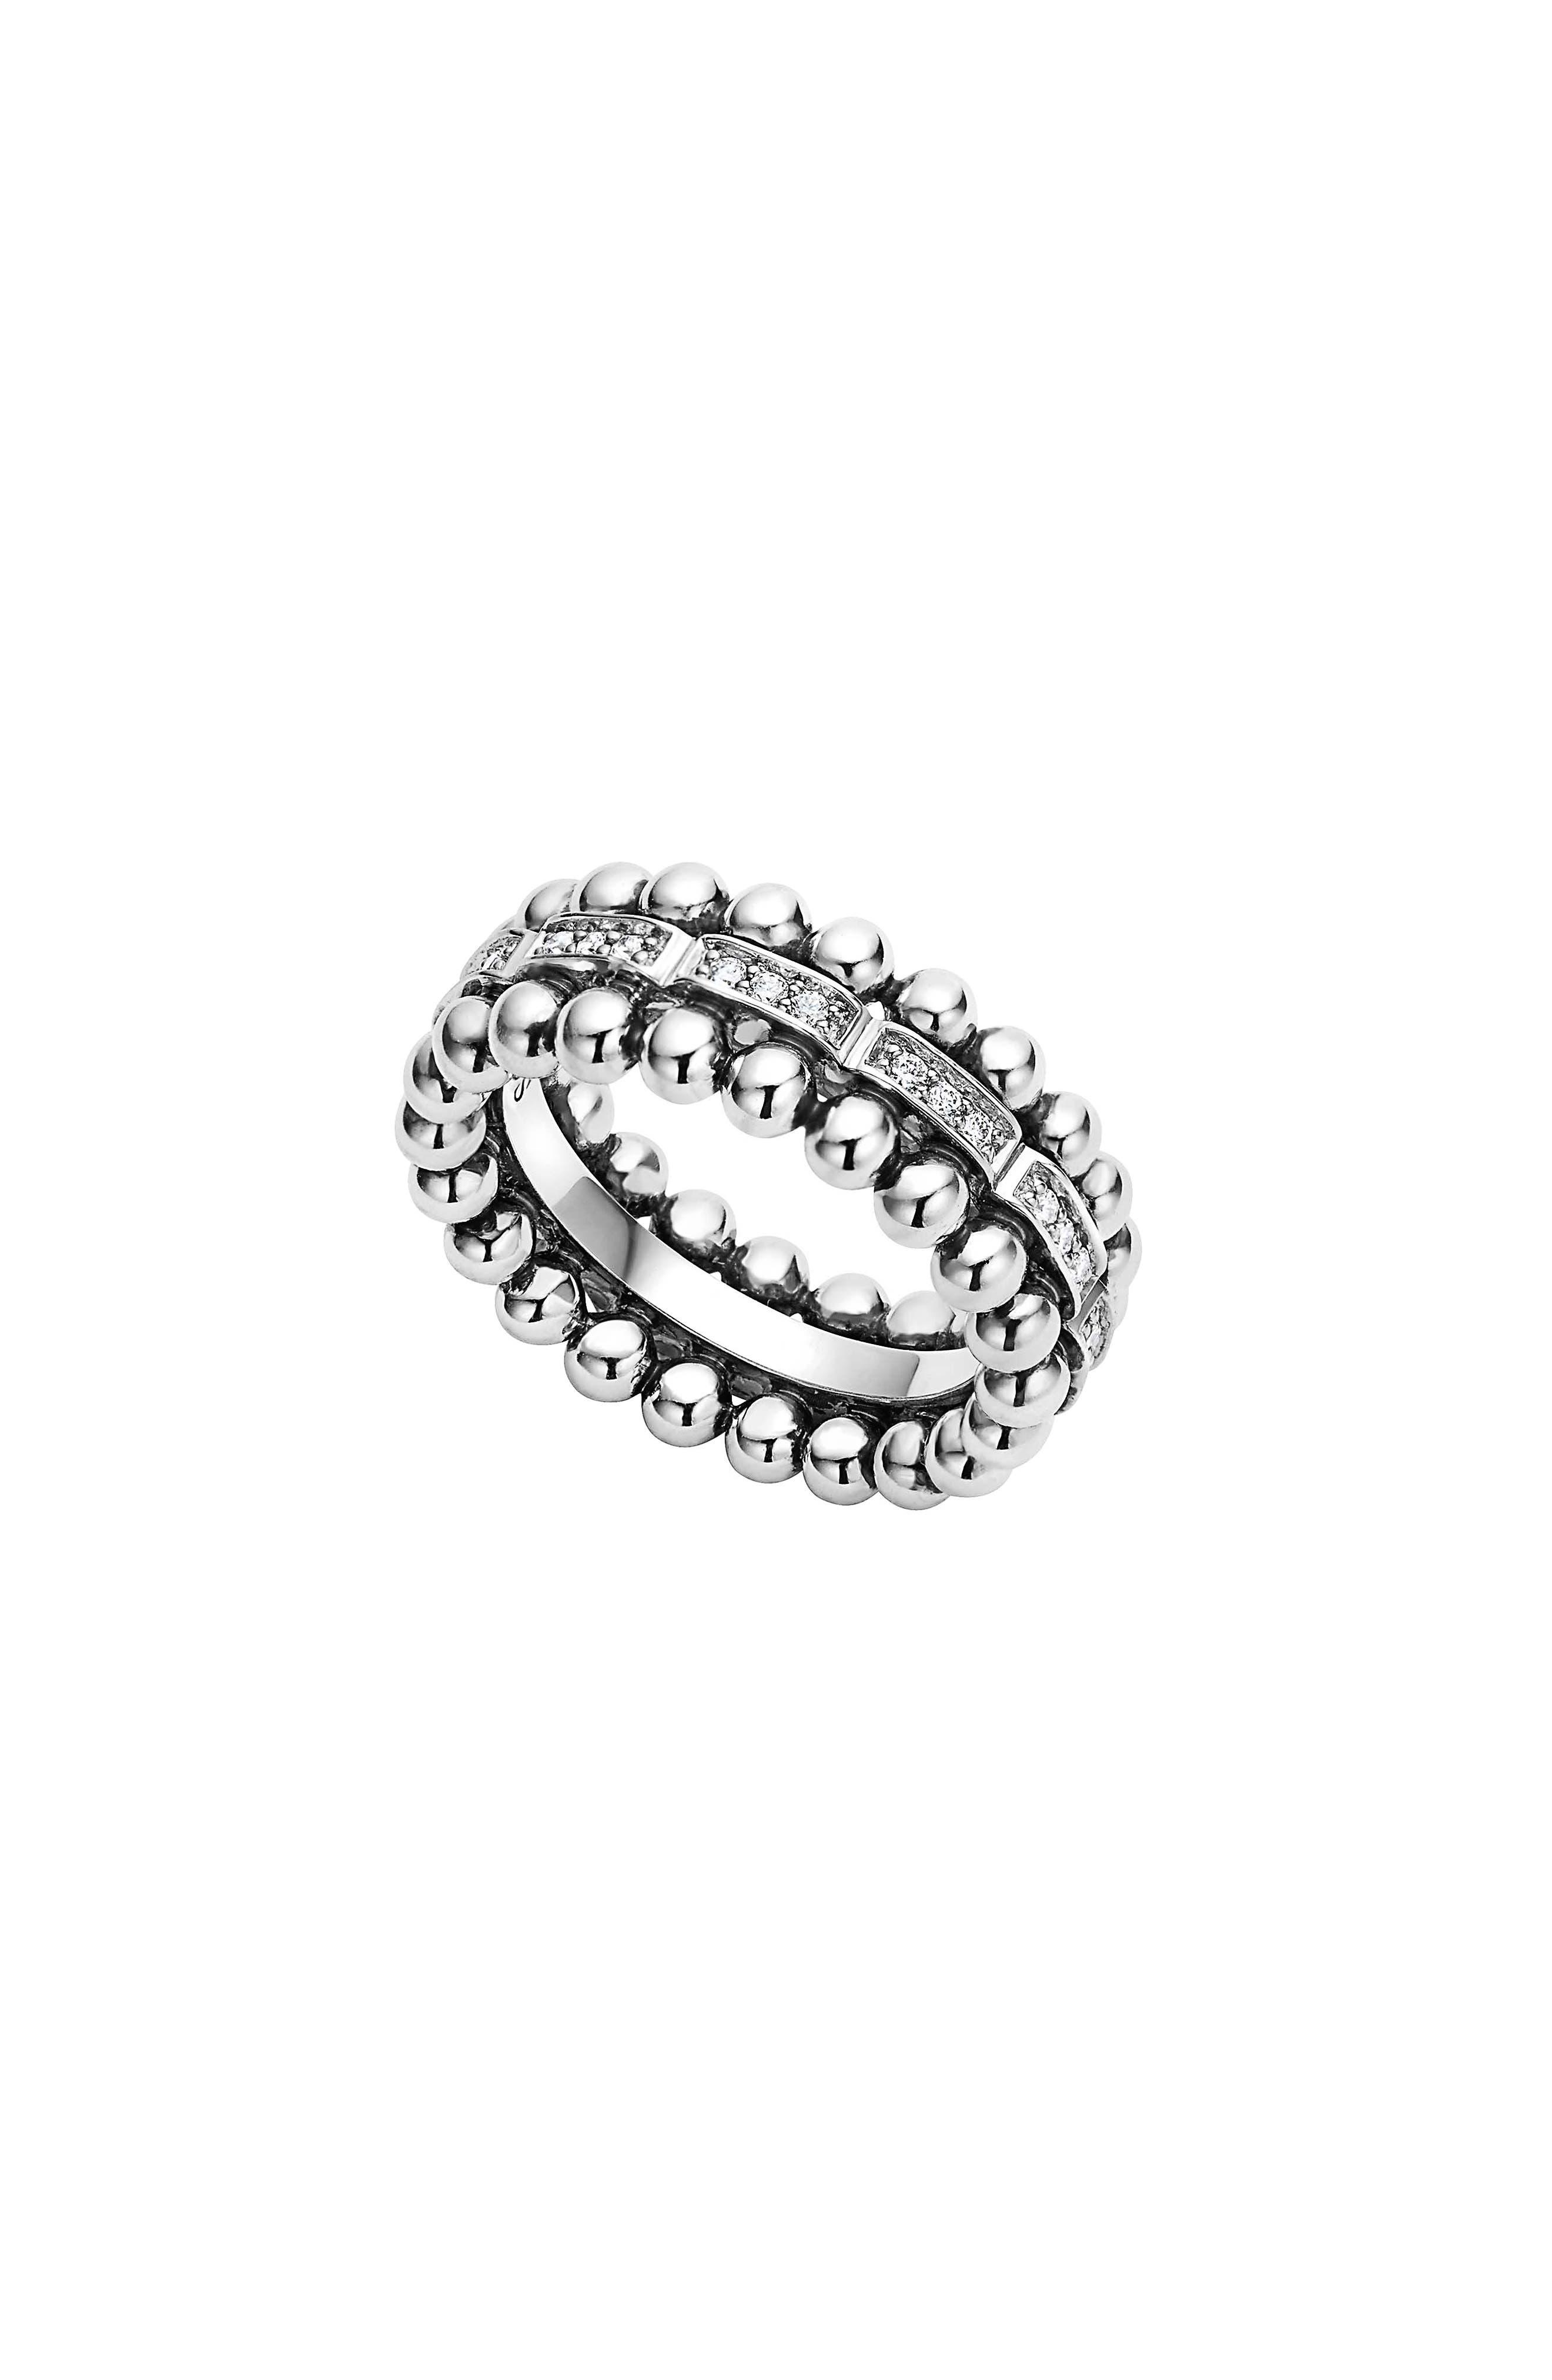 Caviar Spark Diamond Band Ring,                             Main thumbnail 1, color,                             SILVER/ DIAMOND